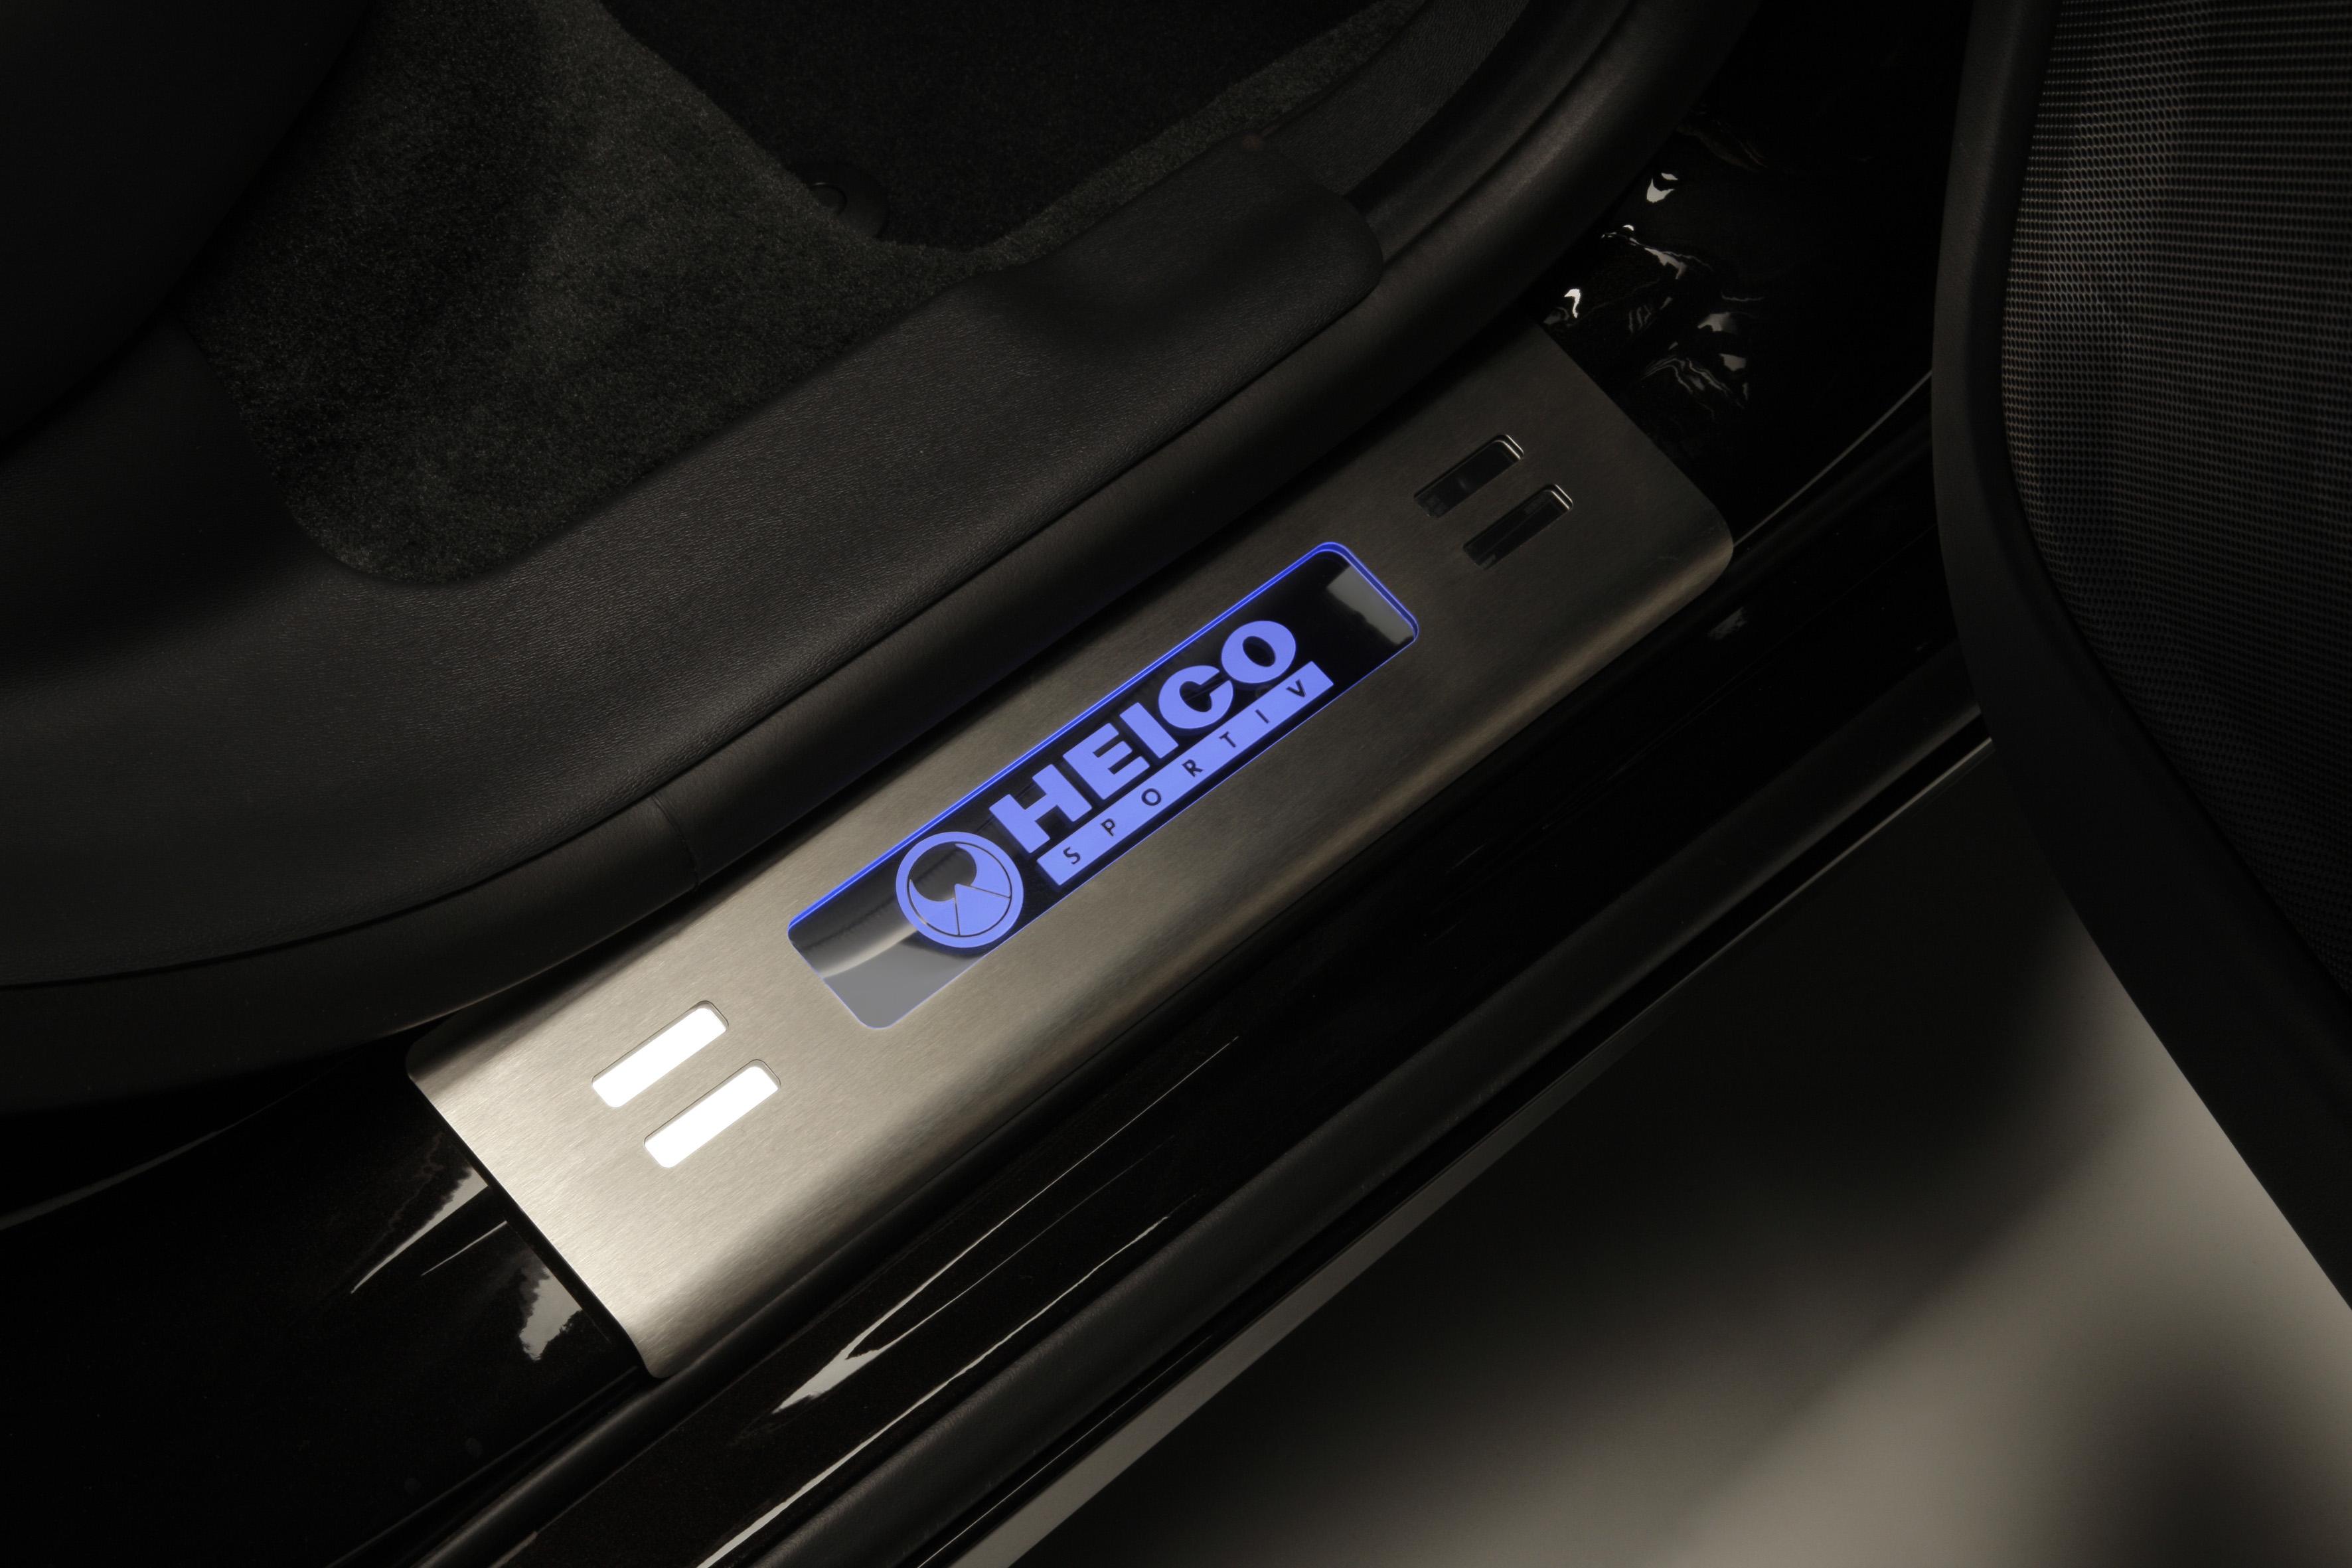 heico_entrence_trim_S60_V60_rear